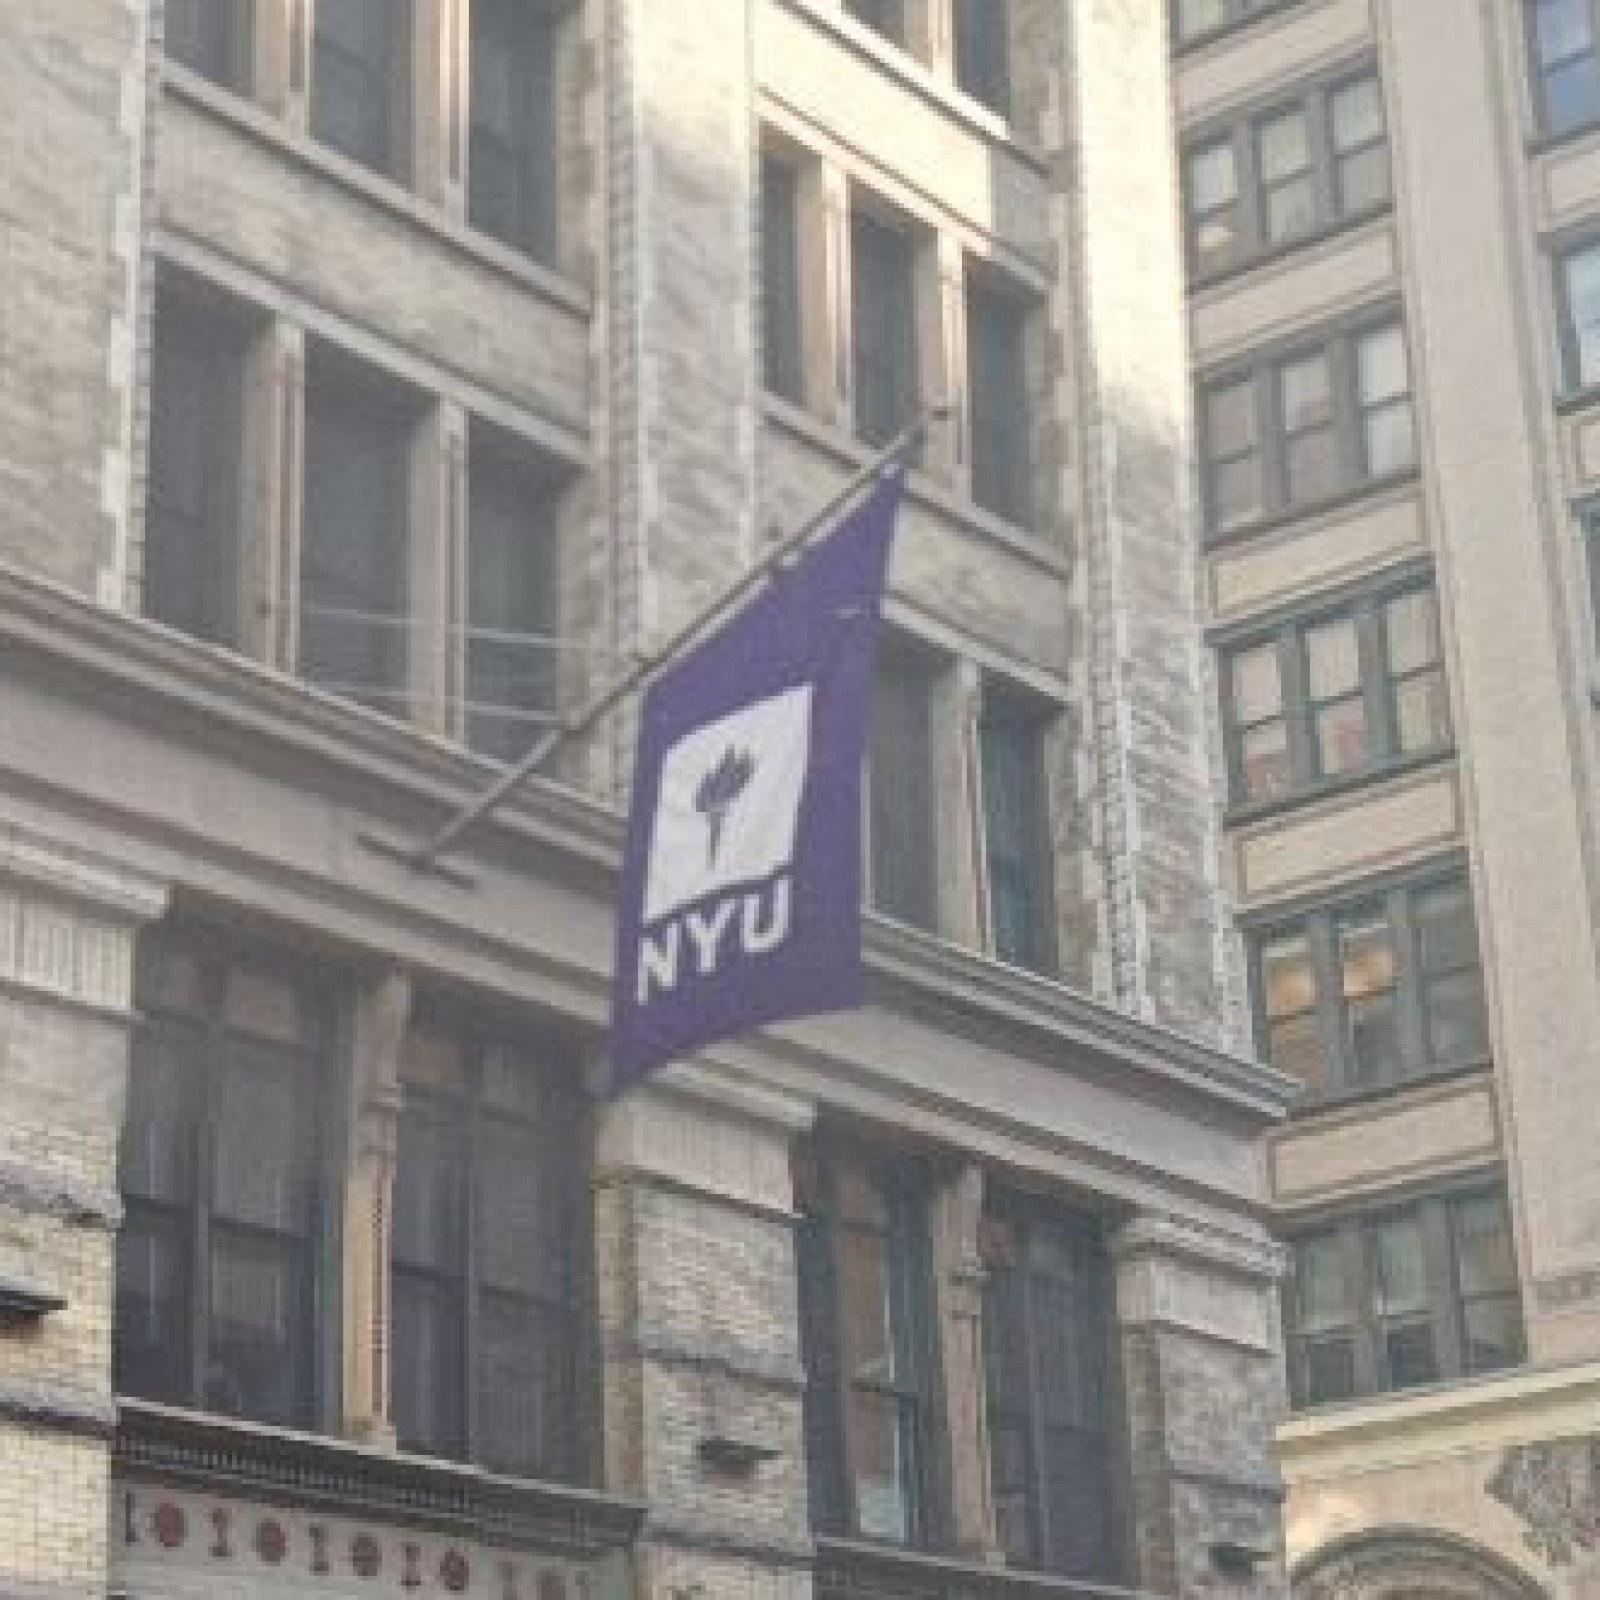 Nyu real estate office